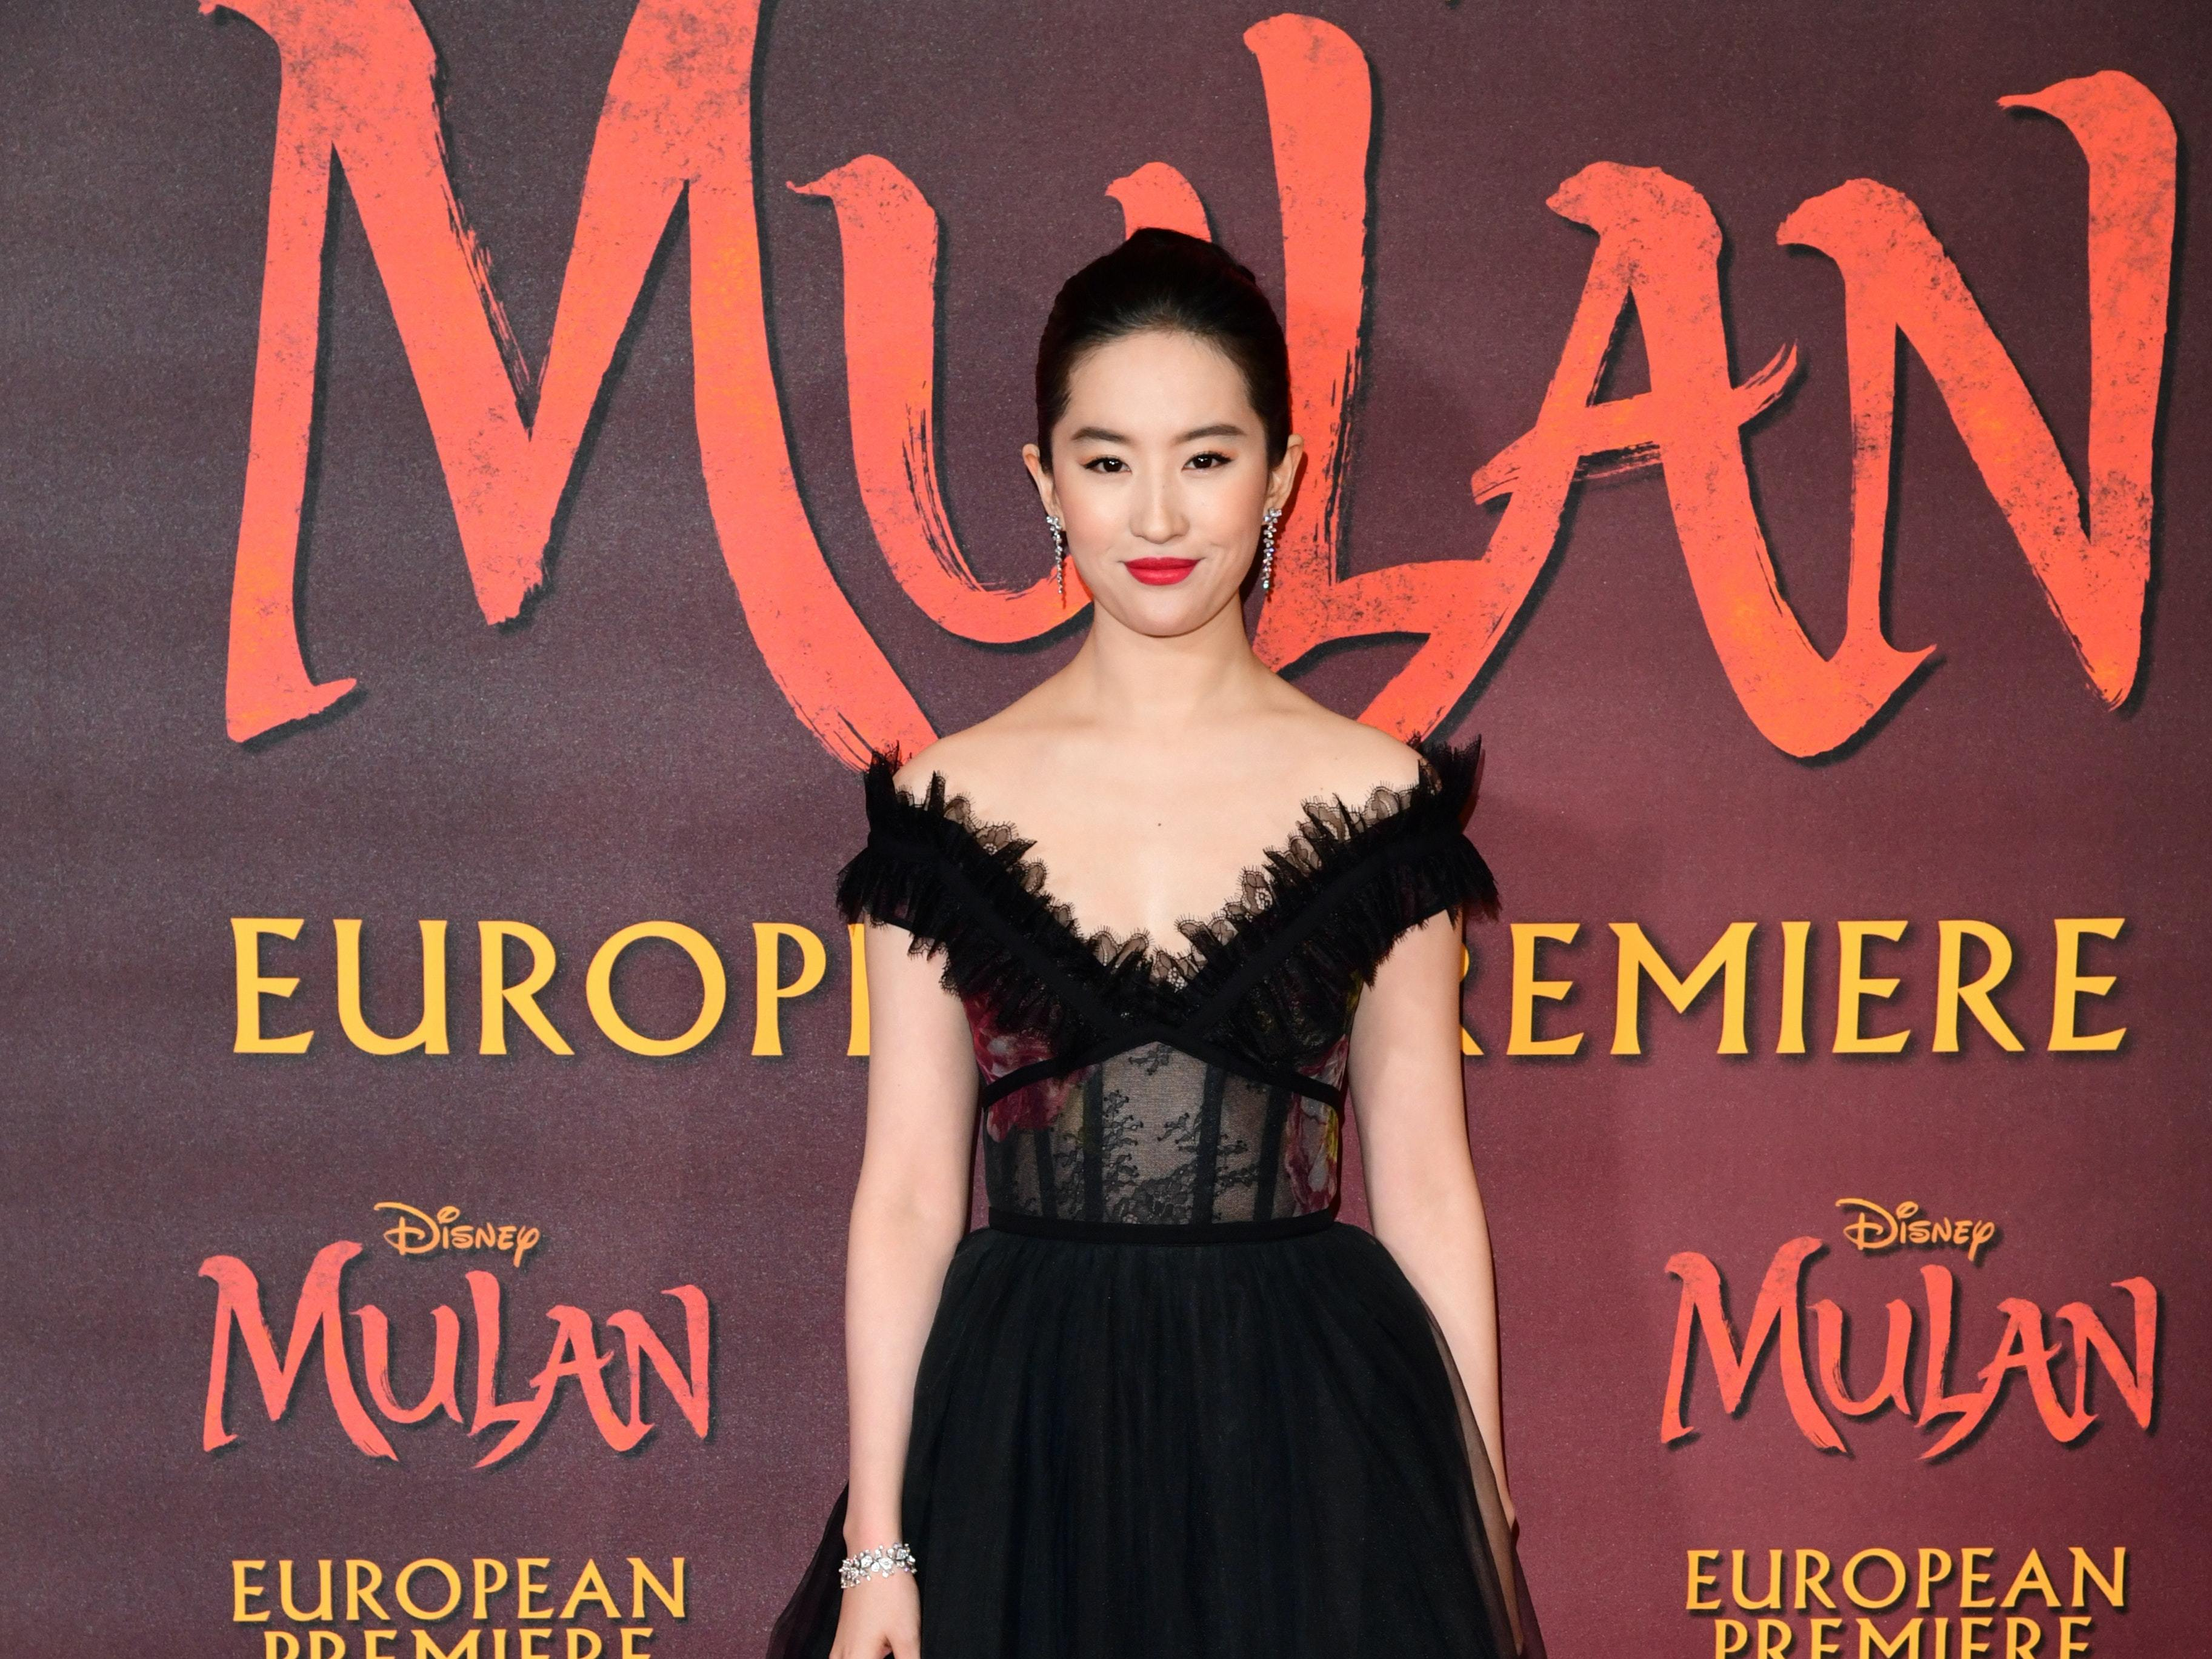 Mulan postponed